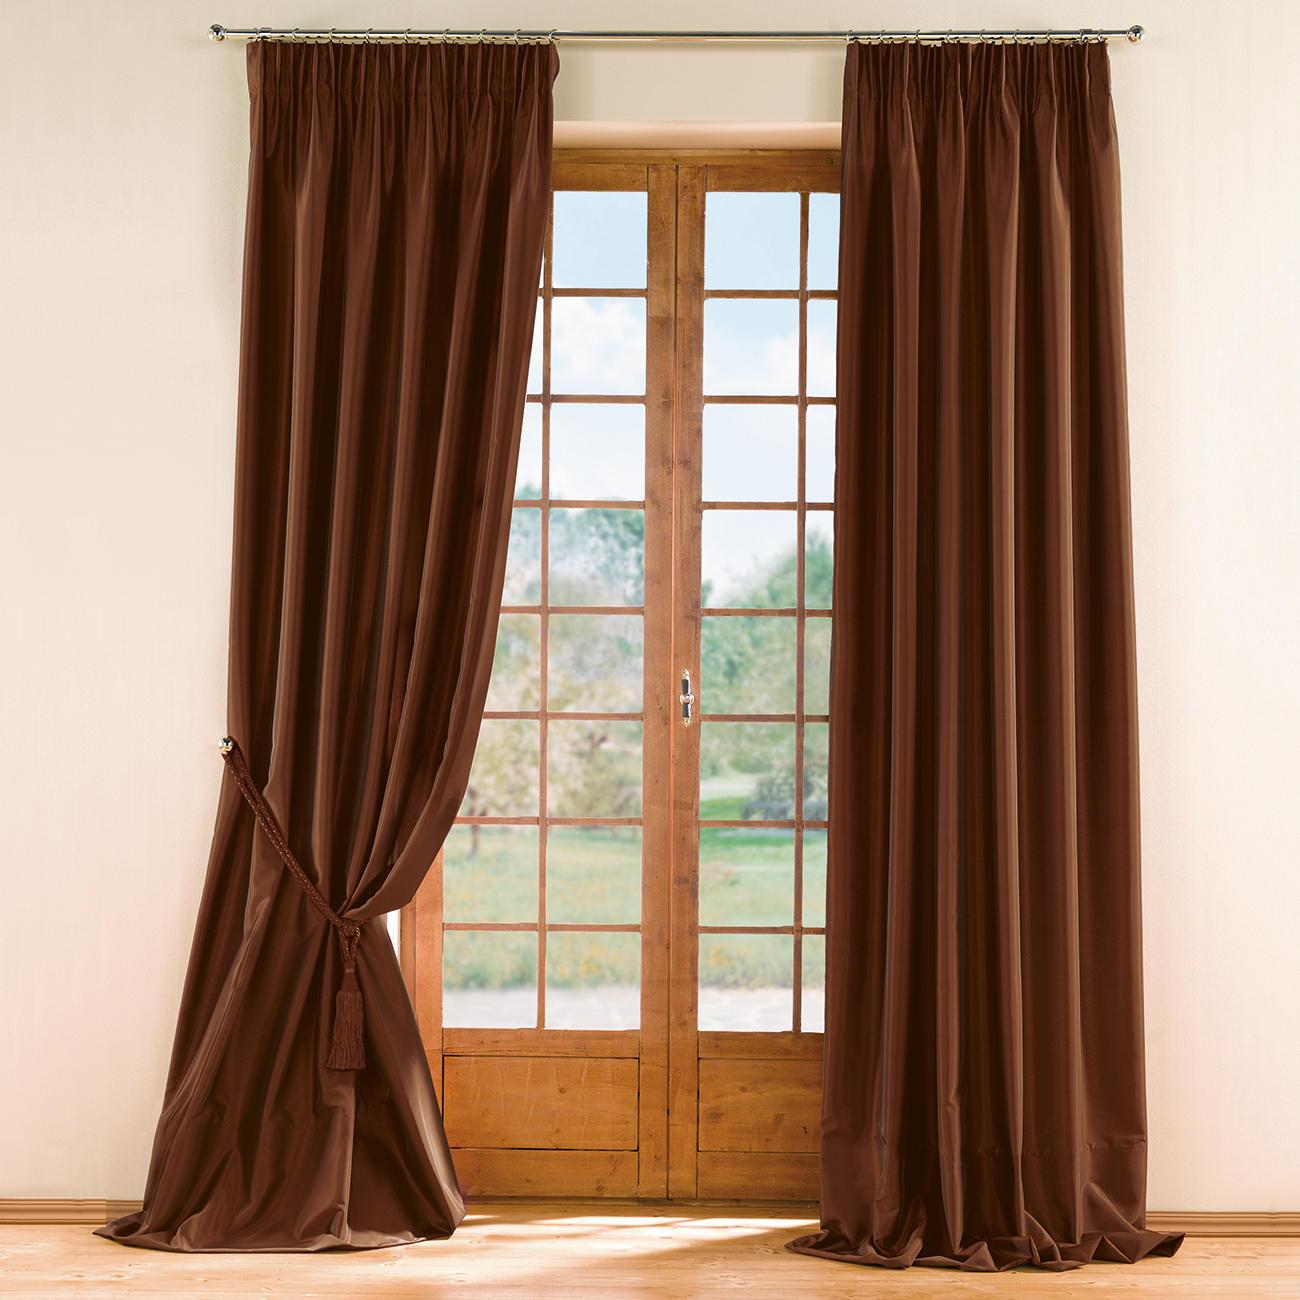 vorhang mandria vorh nge kaufen das kavaliershaus. Black Bedroom Furniture Sets. Home Design Ideas